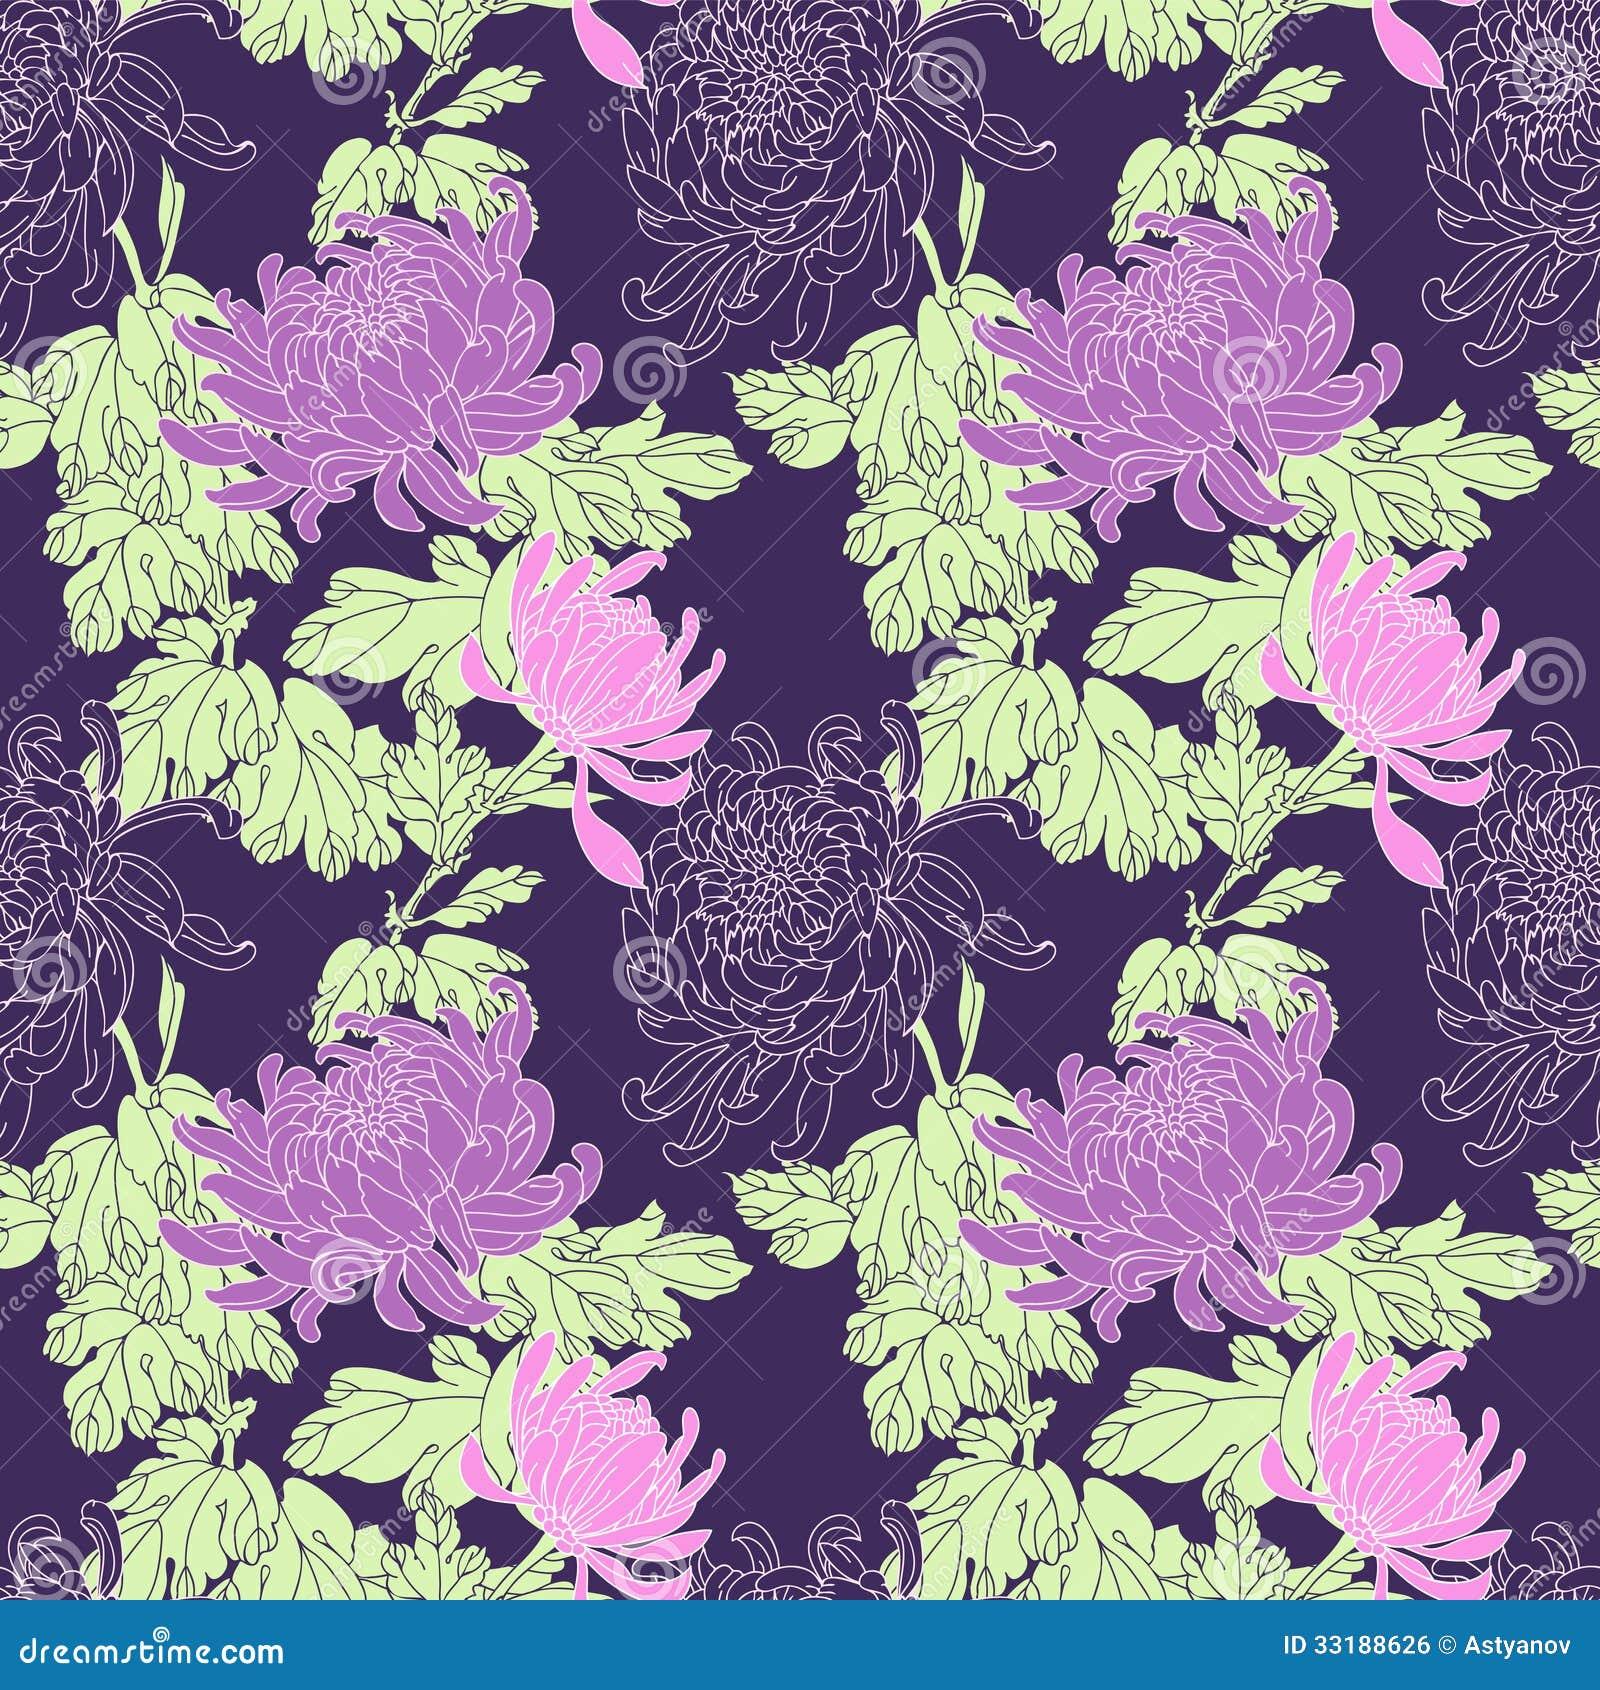 Pink floral seamless vector background floral hrysanthemum seamless - Cartoon Chrysanthemum Flower Pattern Realistic Seamless